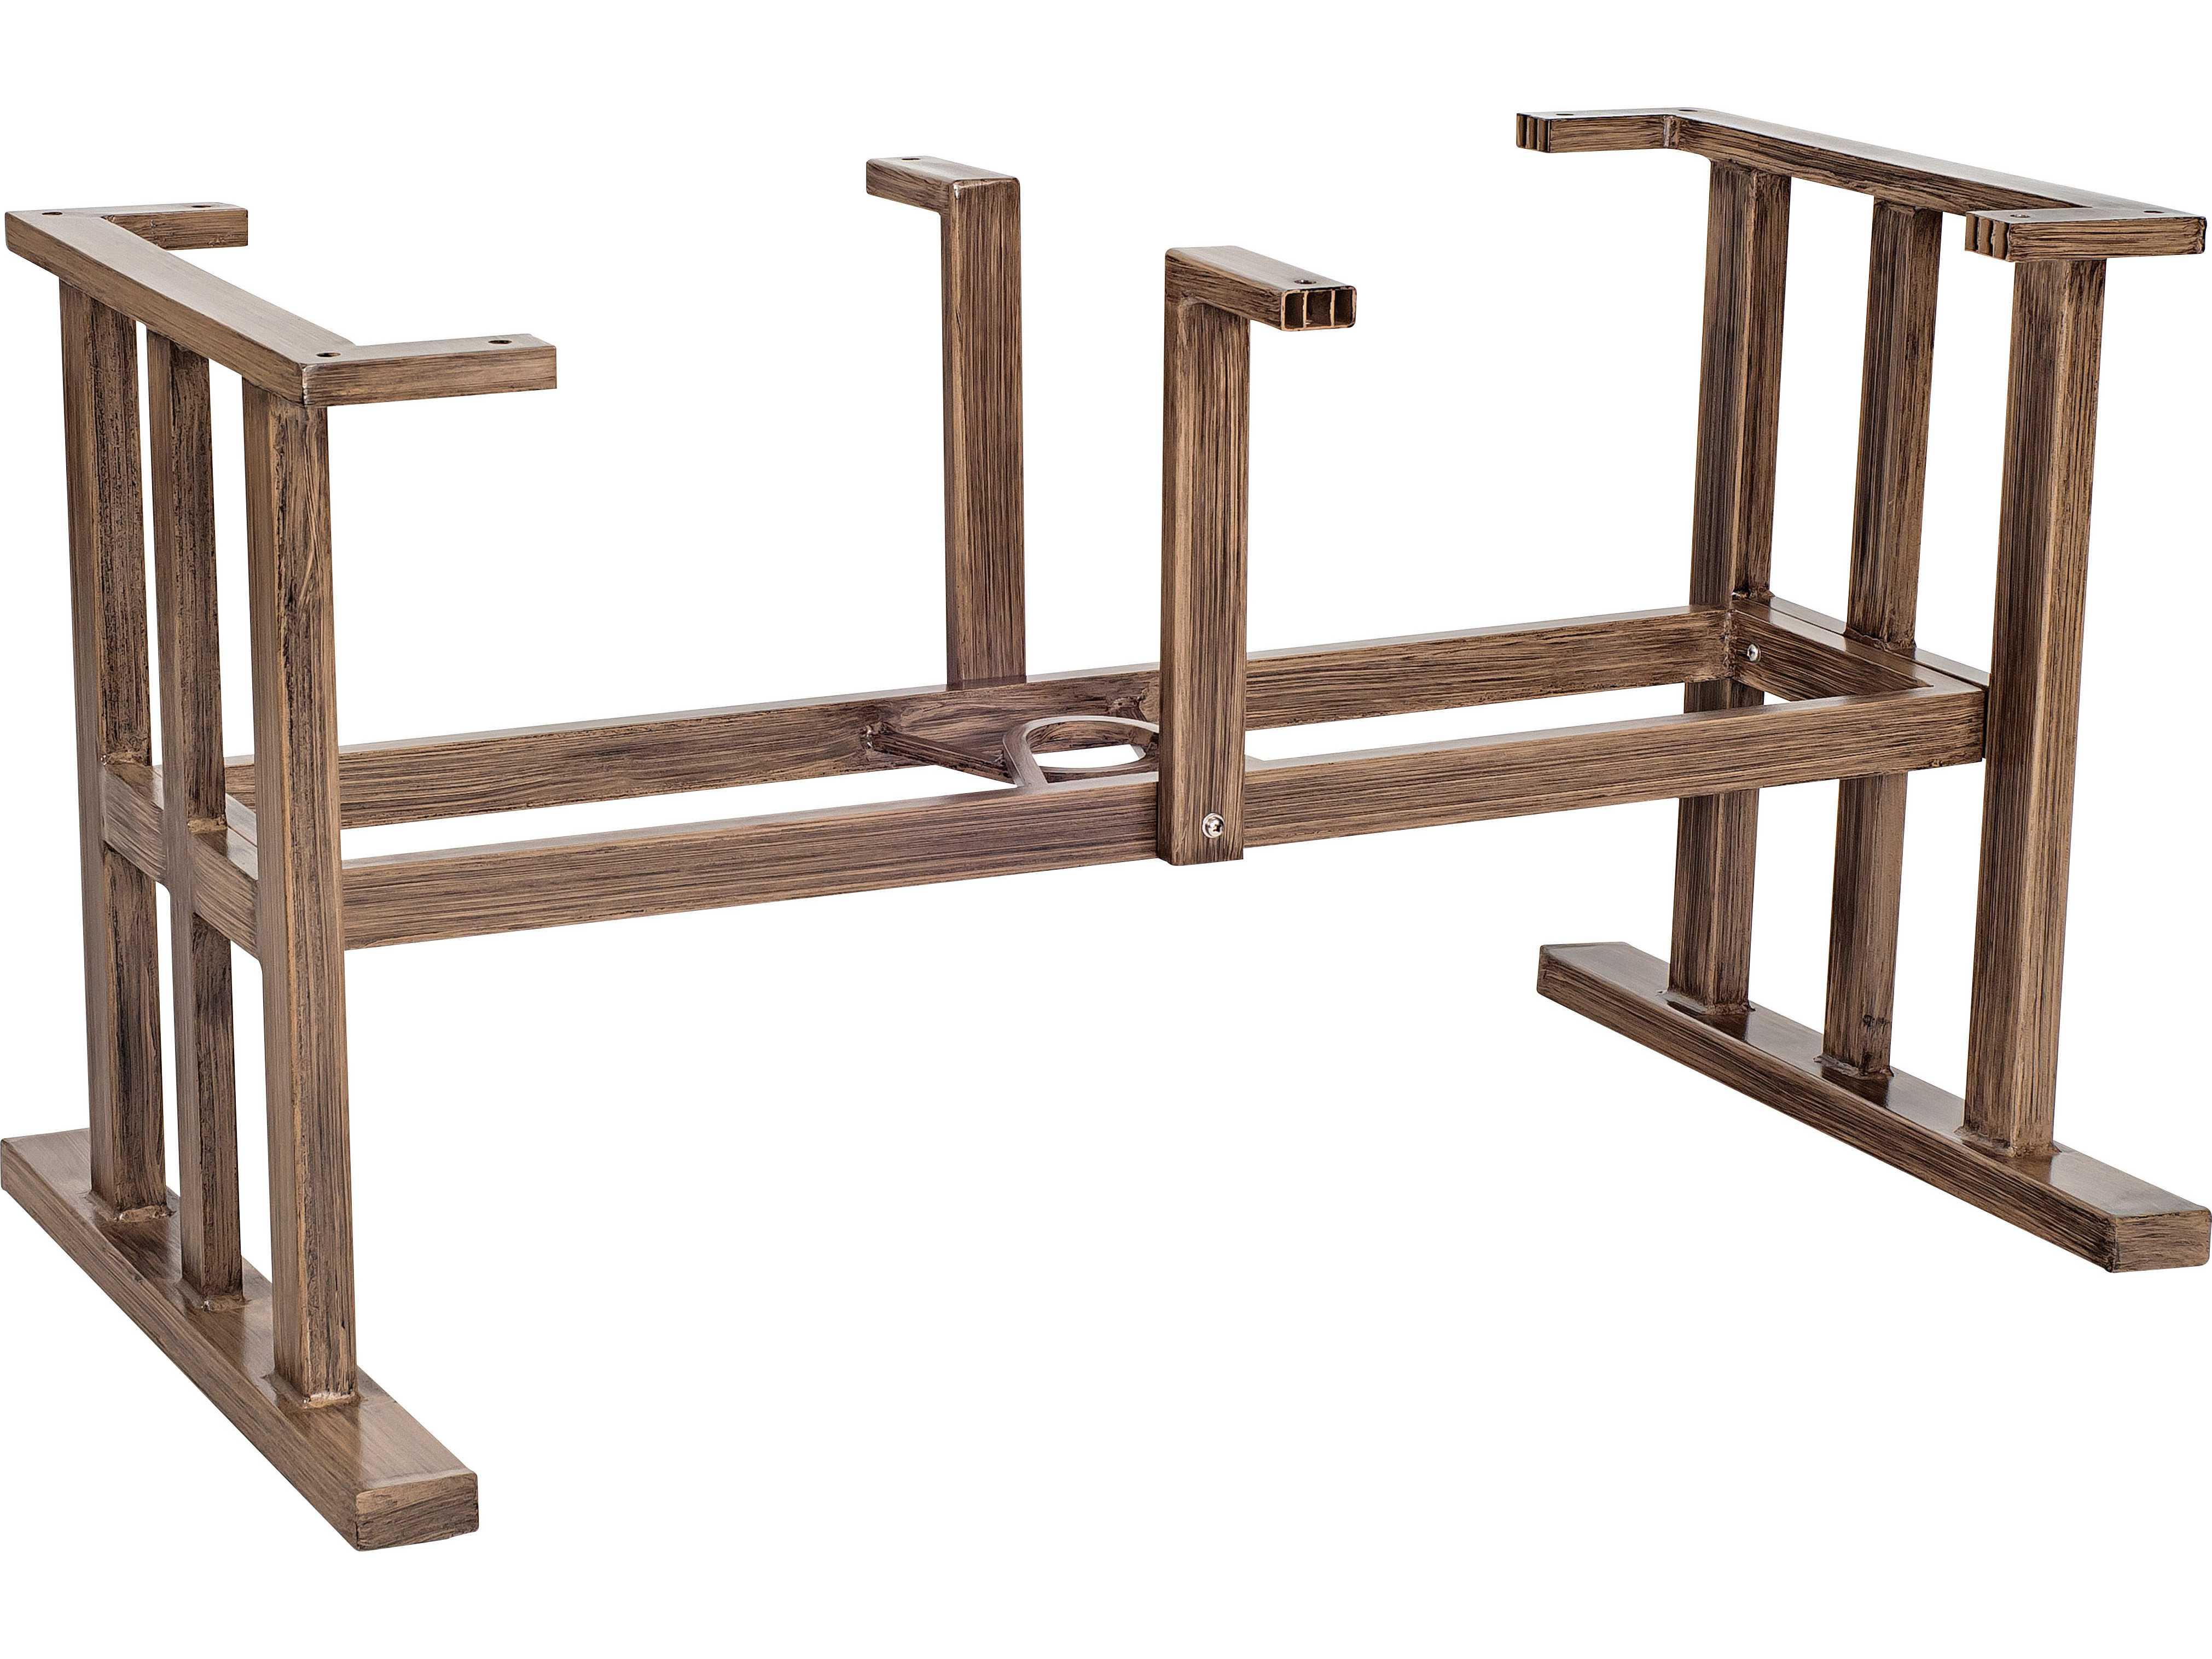 Woodard Trestle Large Aluminum Dining Table Base 2Q8400 : WR2Q8400zm from www.patioliving.com size 4043 x 3033 jpeg 589kB